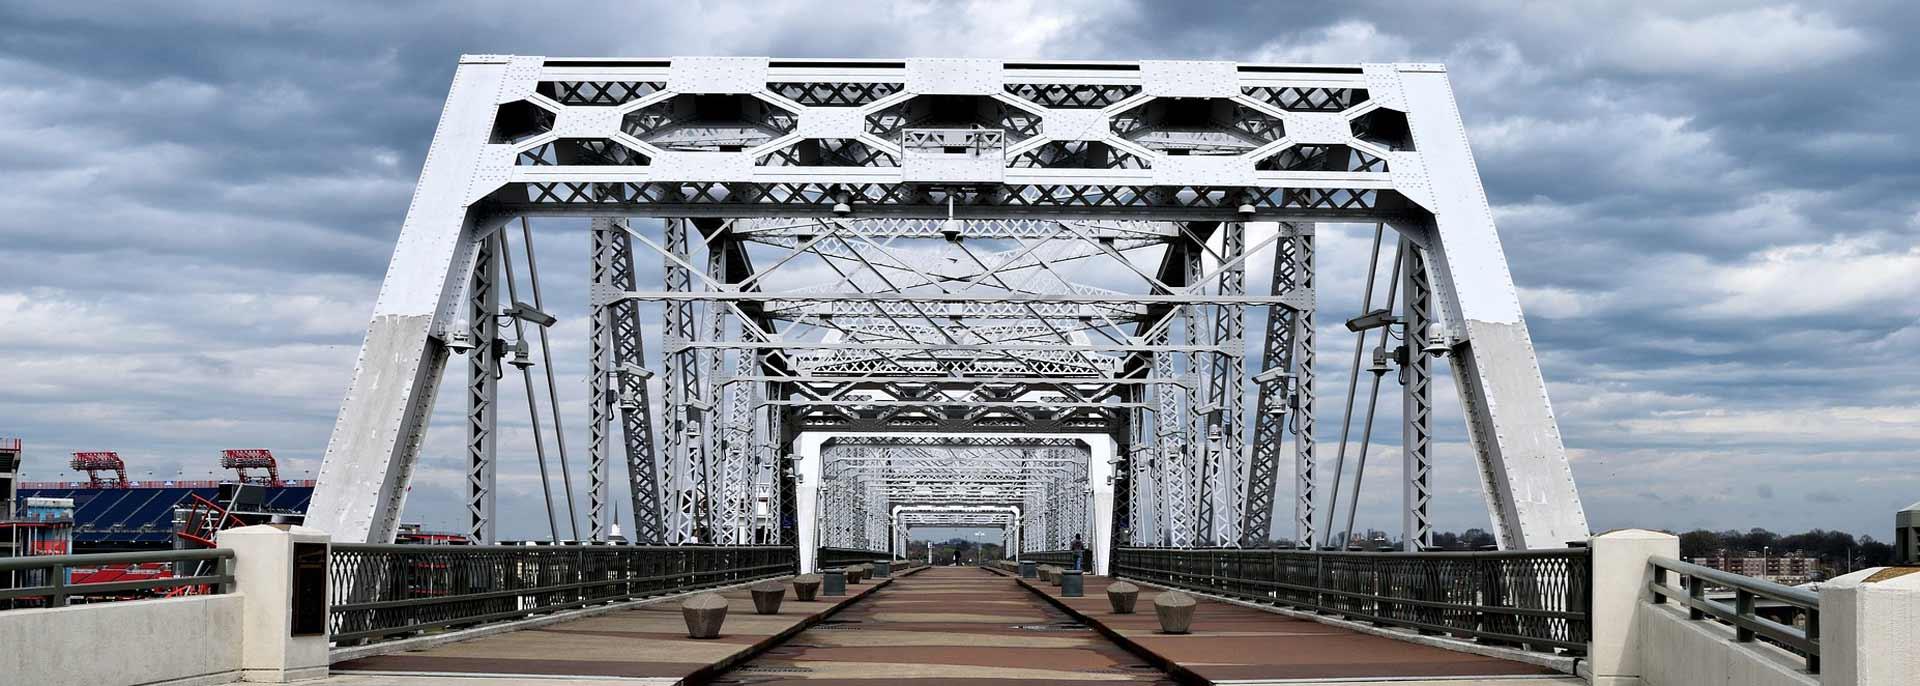 web-prsa-nashville-bridge